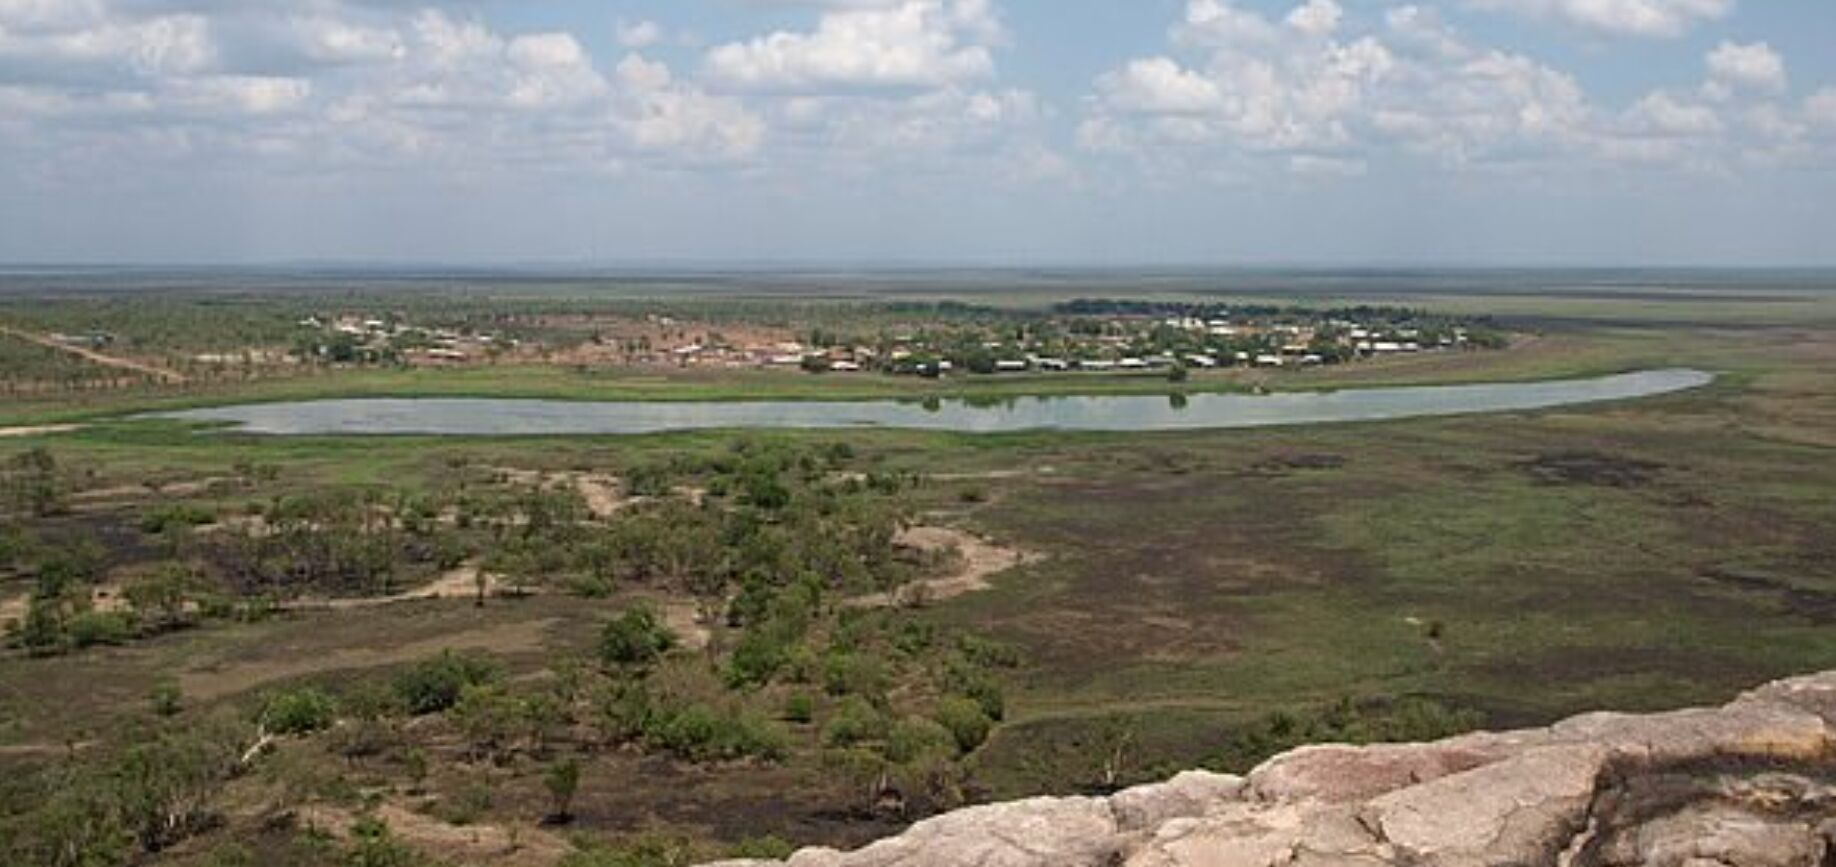 Гунбаланья – місто аборигенів Австралії